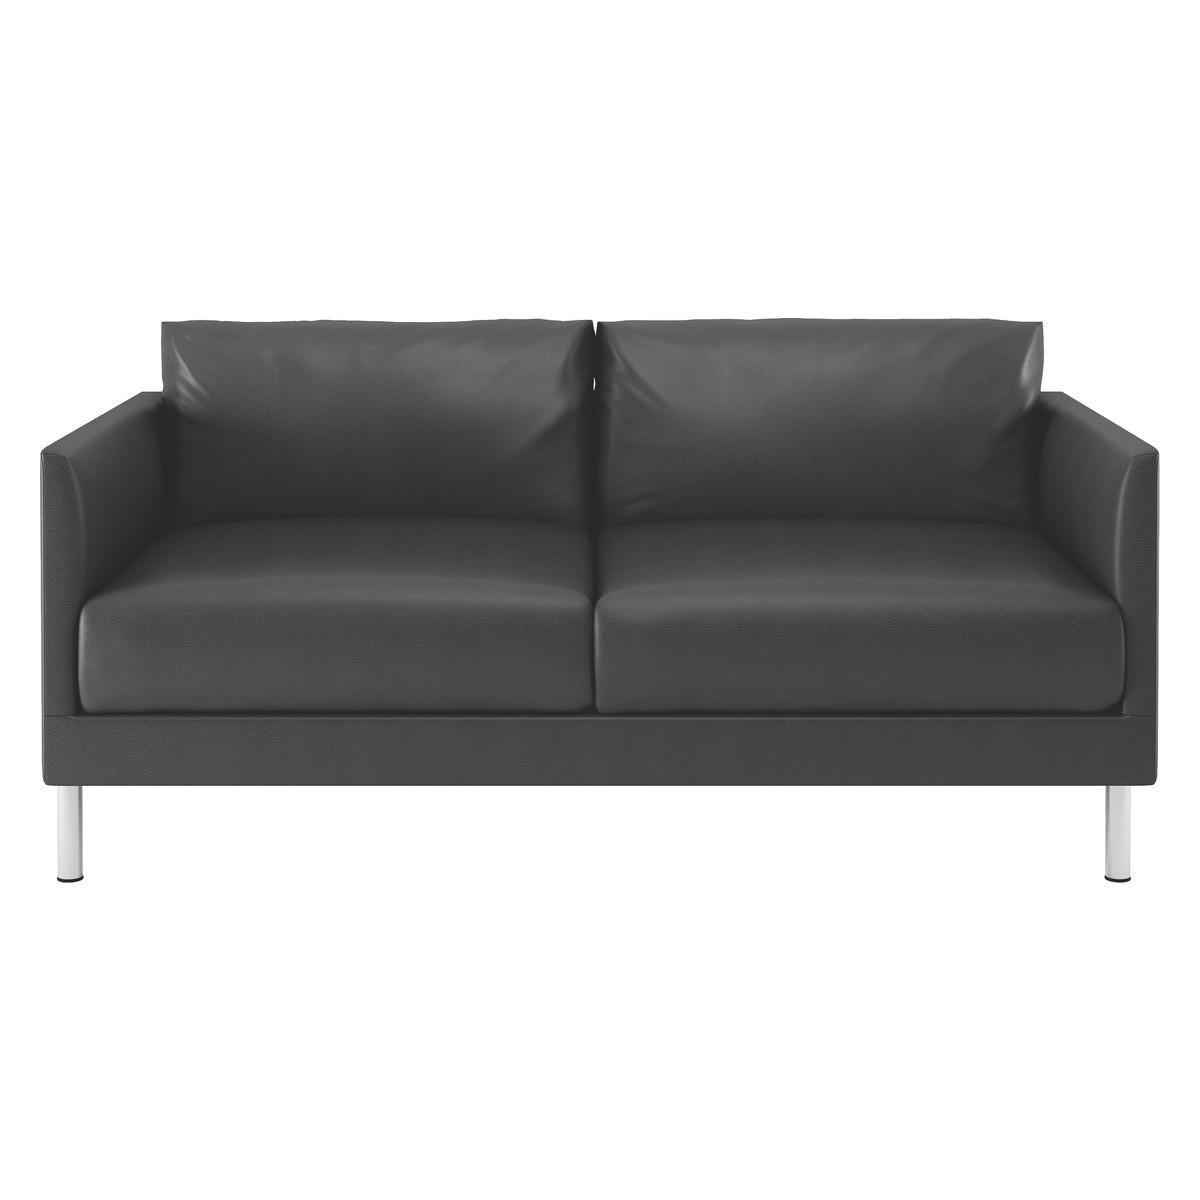 Hyde Black Leather 2 Seater Sofa, Metal Legs | Buy Now At Habitat Uk Regarding Black 2 Seater Sofas (Image 12 of 20)